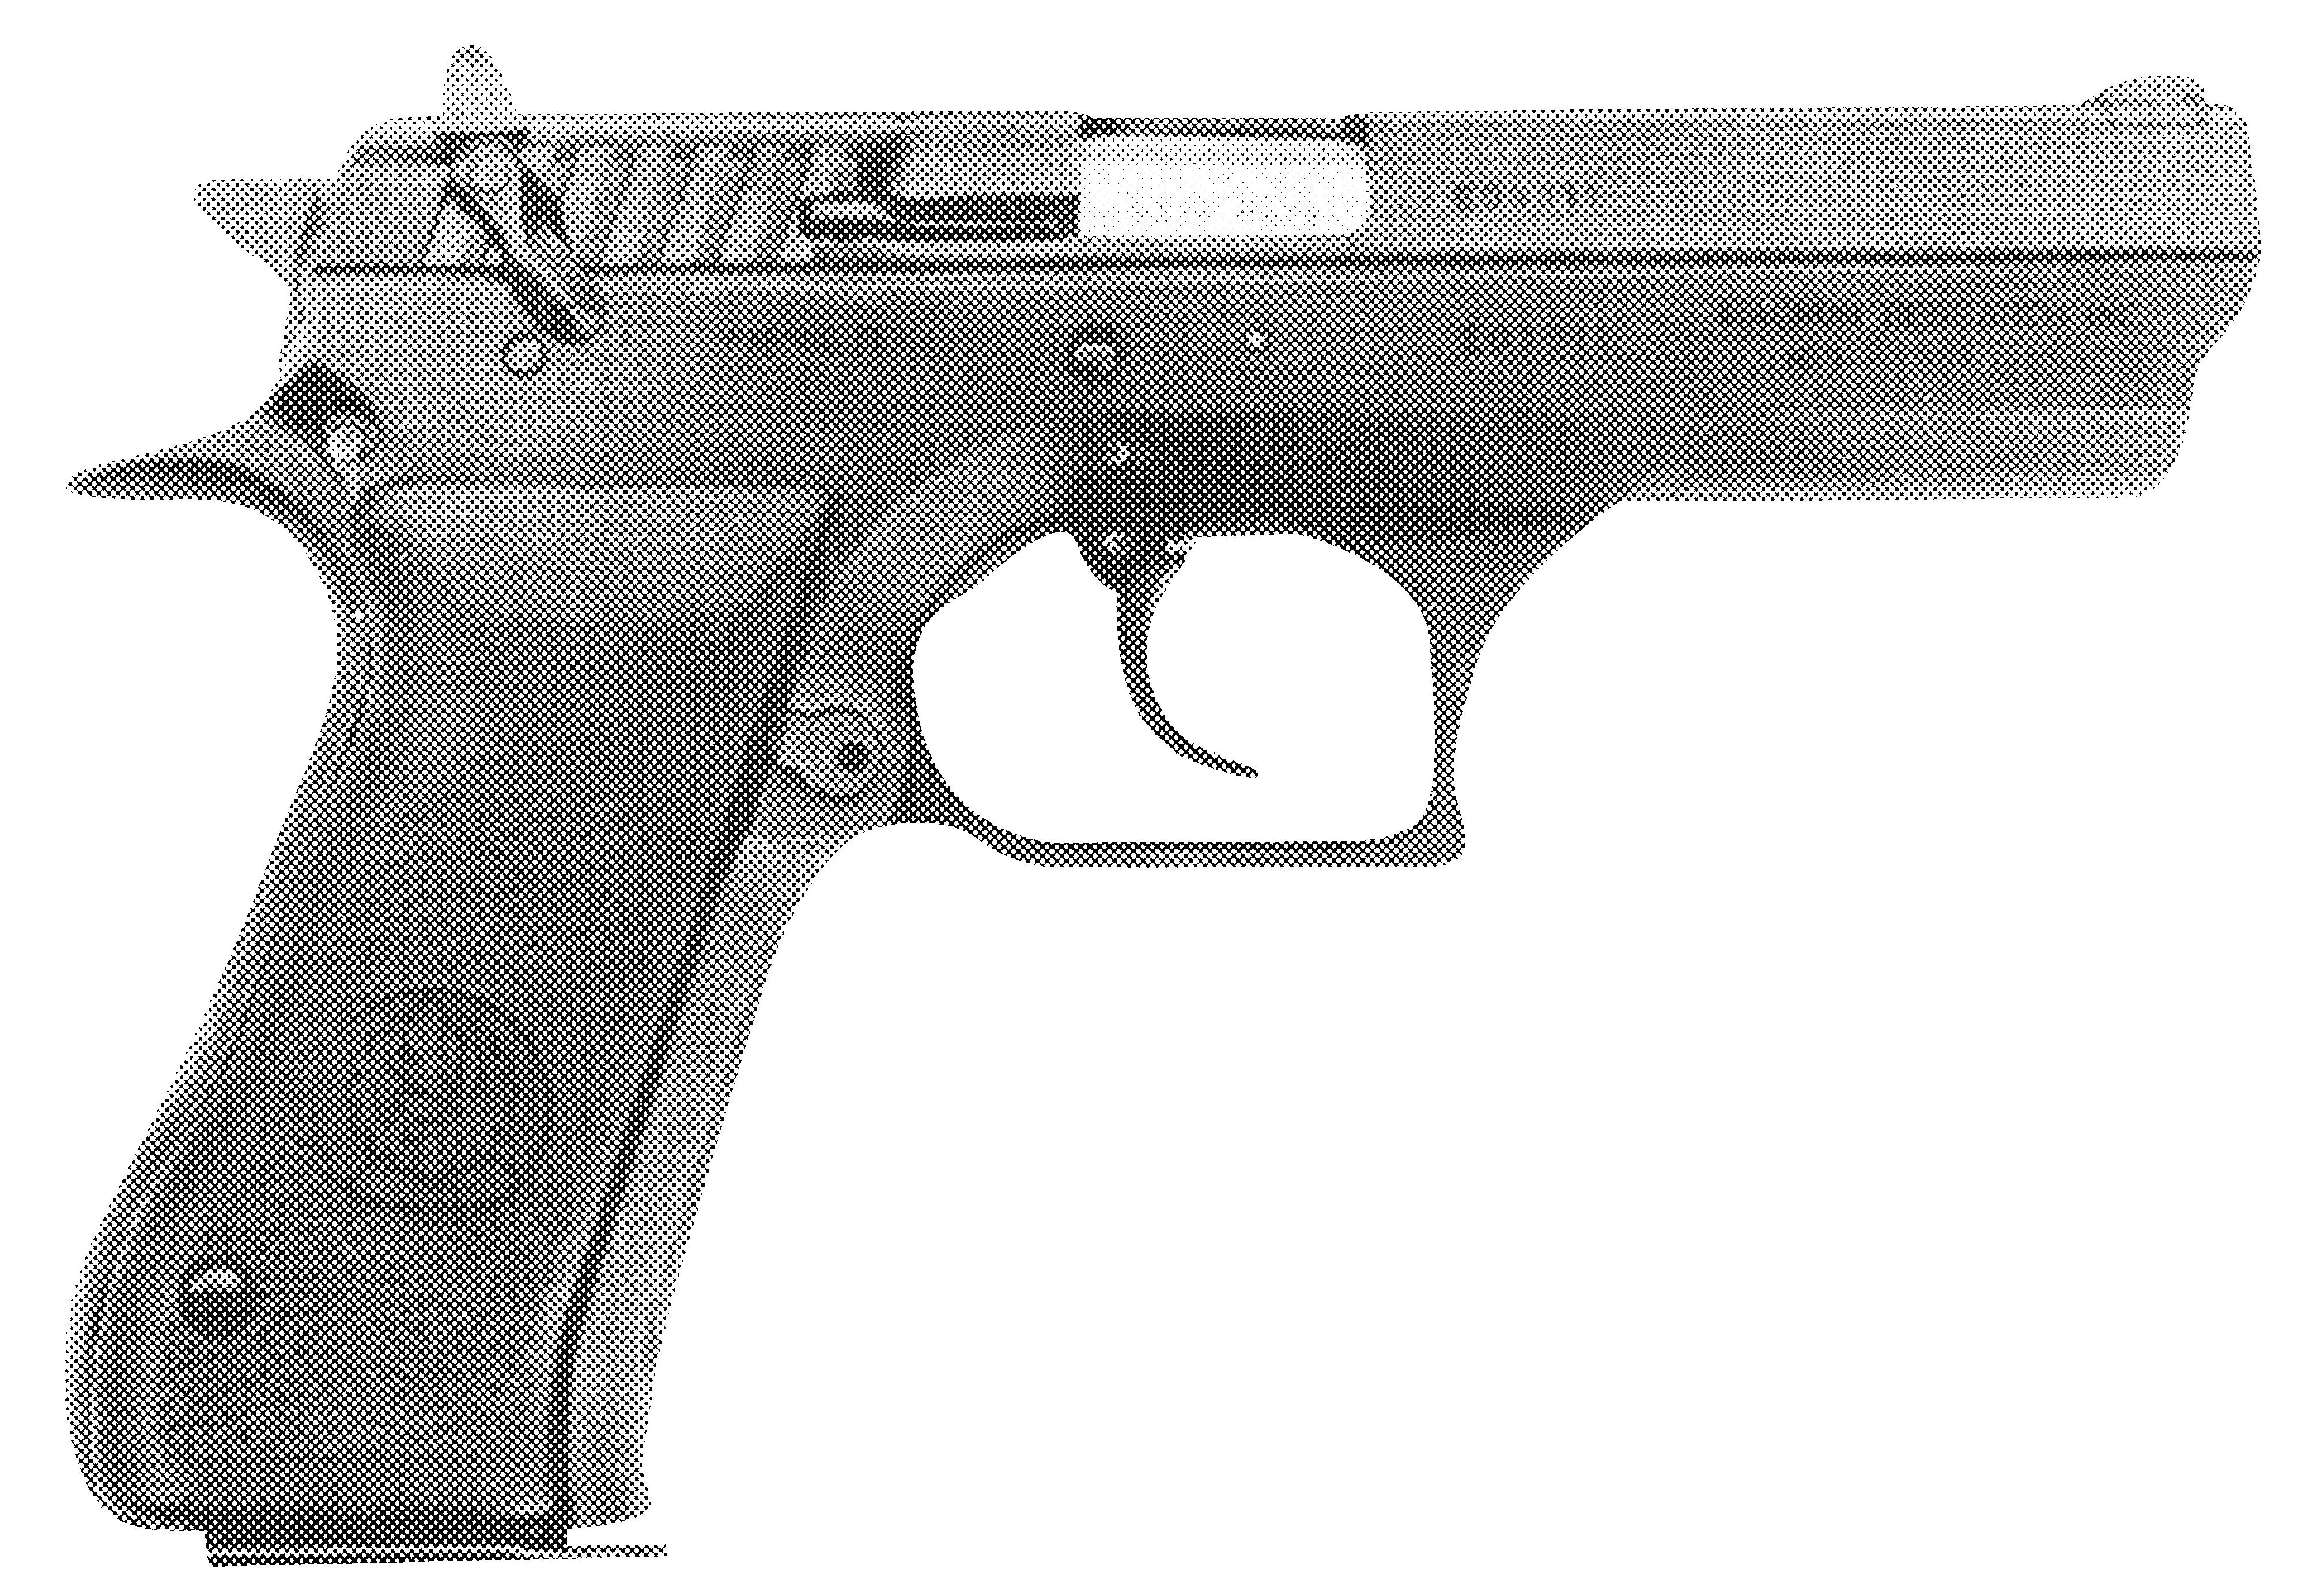 9mm (Standard)